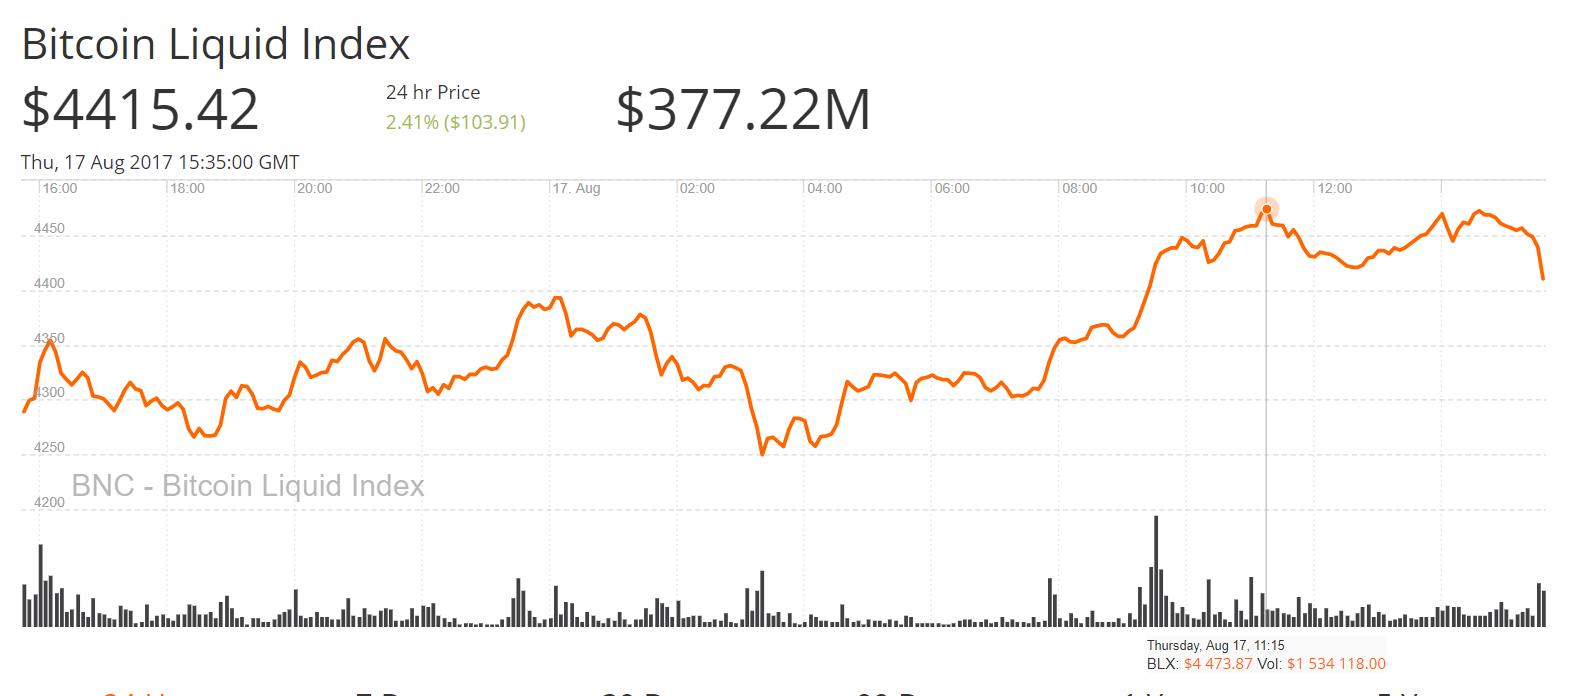 Bitcoin Surging Demand Amidst Economic Uncertainty